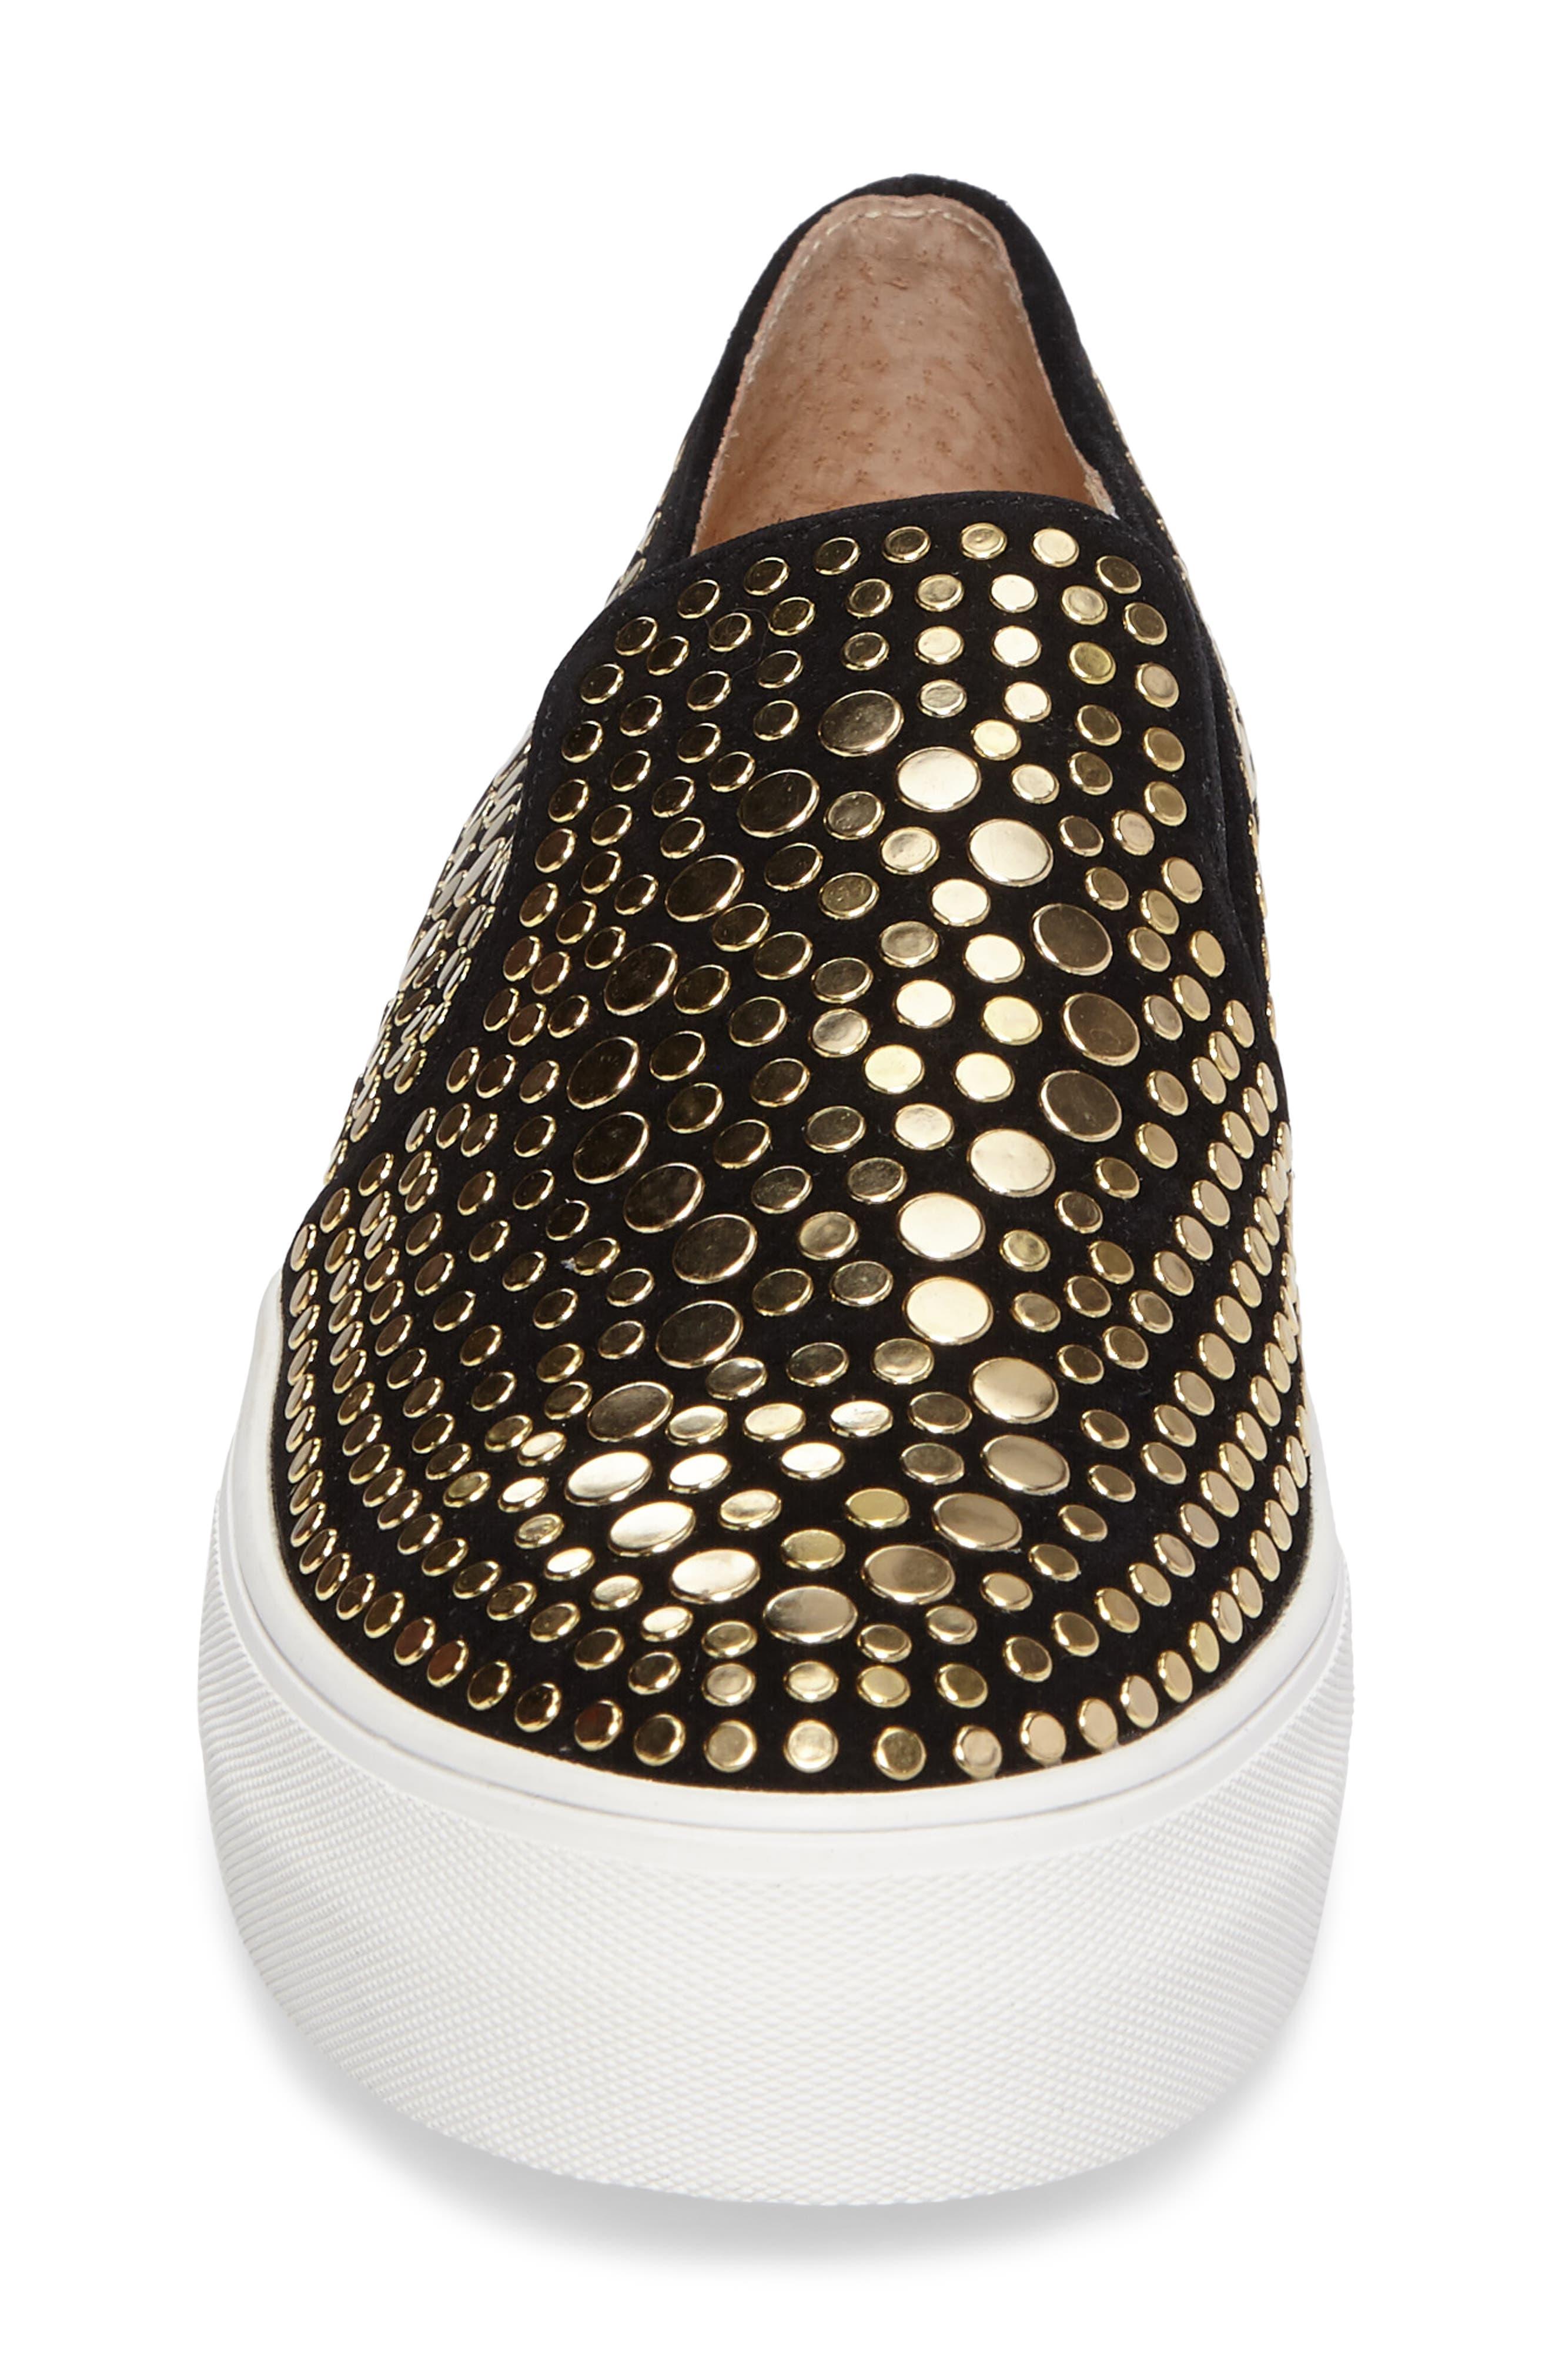 Kindra Stud Slip-On Sneaker,                             Alternate thumbnail 4, color,                             Black Suede